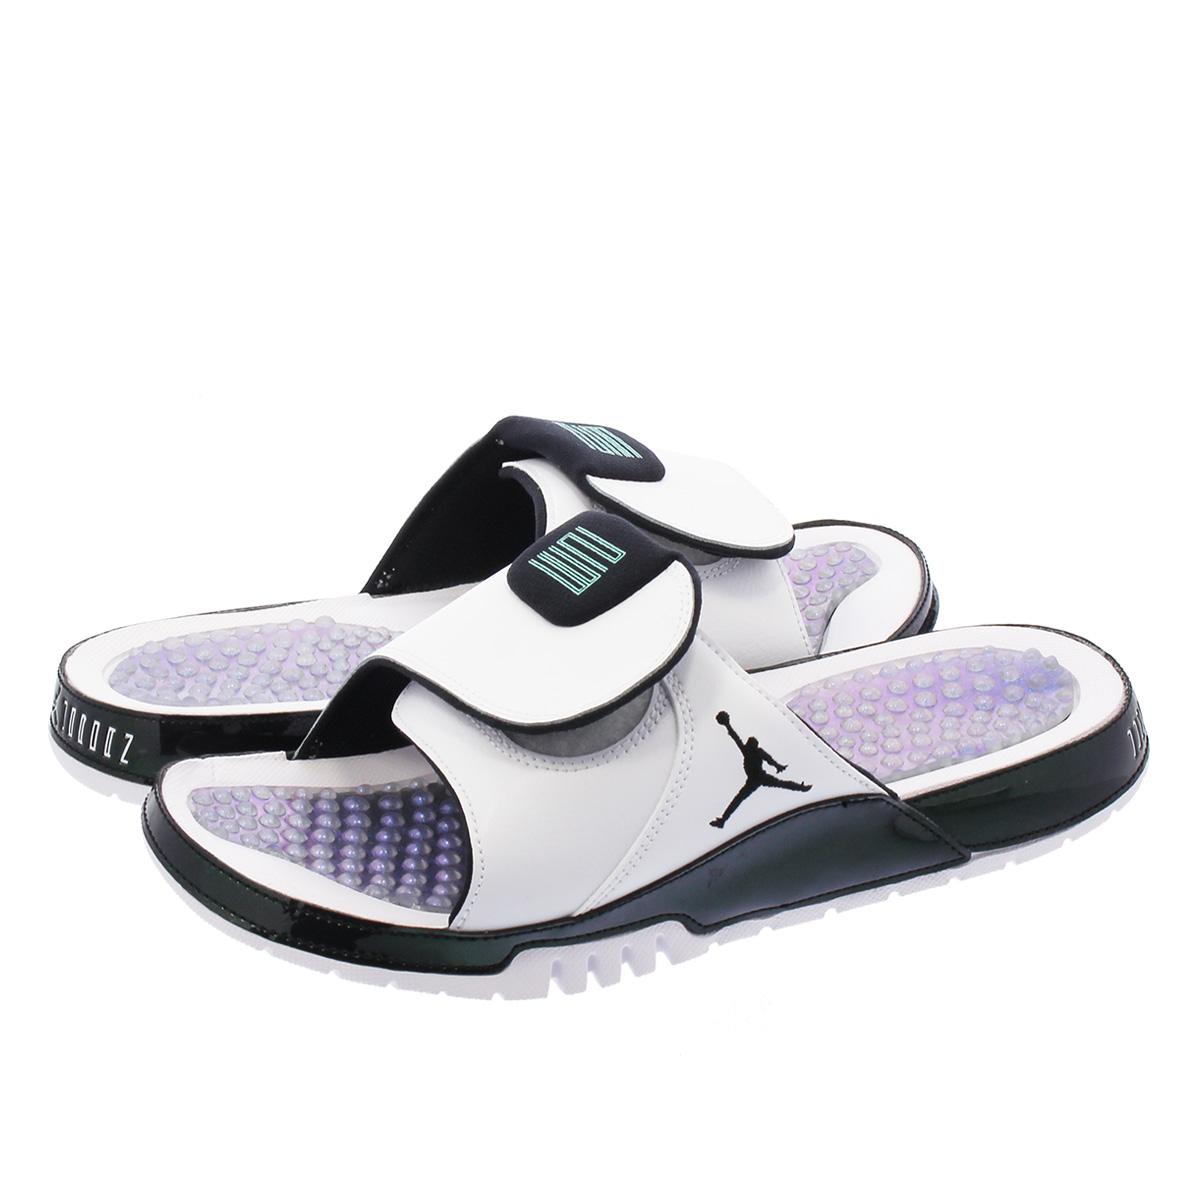 8fa84b6f0edd NIKE JORDAN HYDRO XI RETRO Nike Jordan high mud 11 nostalgic WHITE EMERALD  RISE BLACK aa1336-117